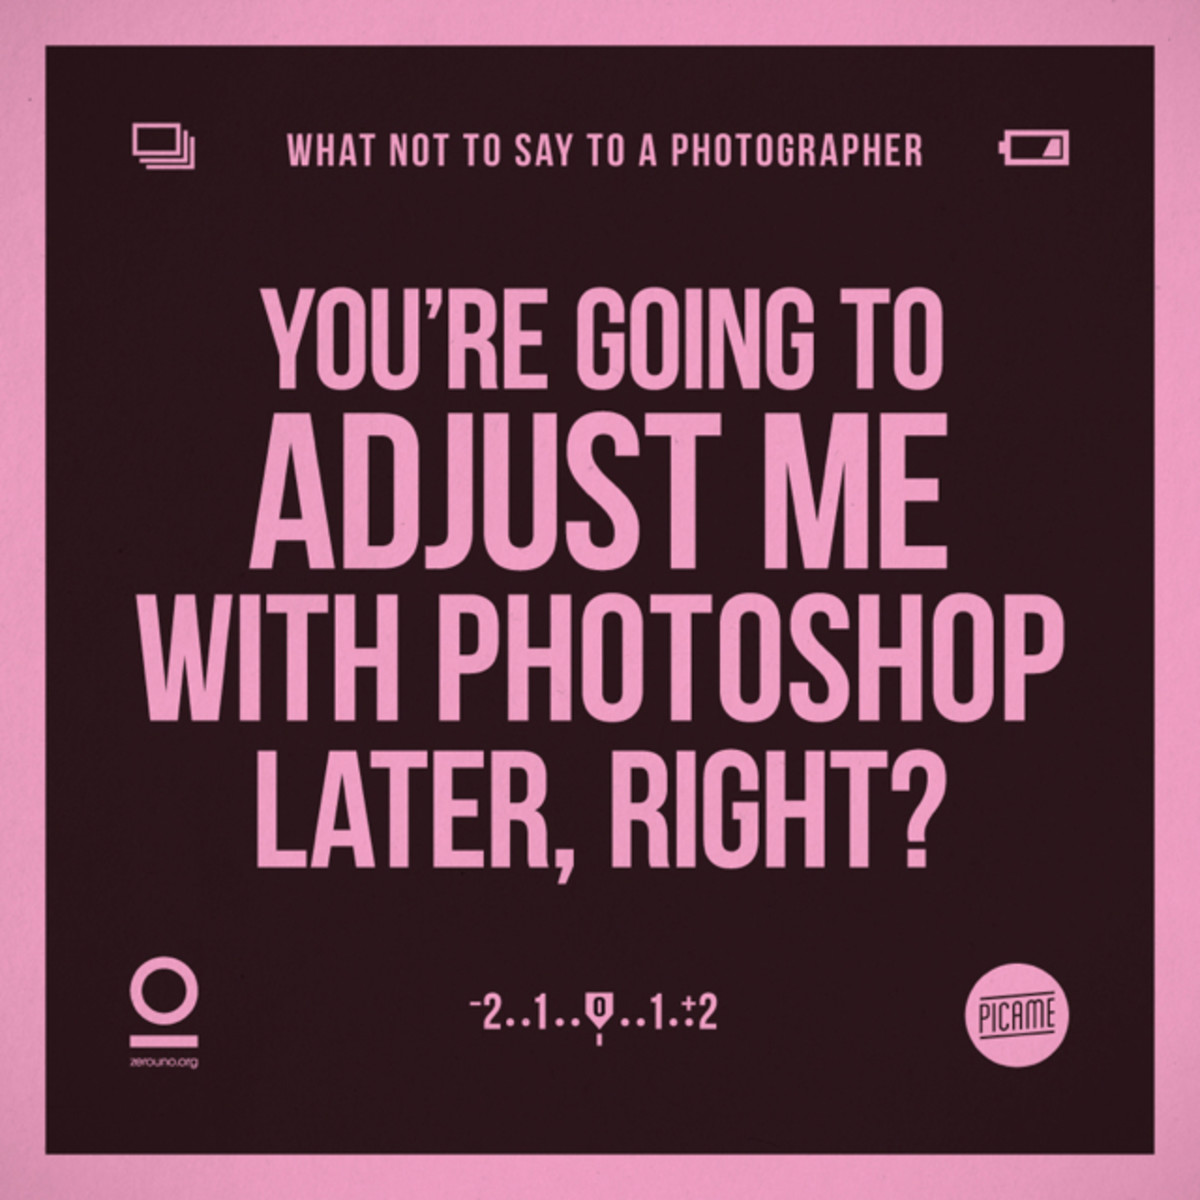 donttellthephotographer02